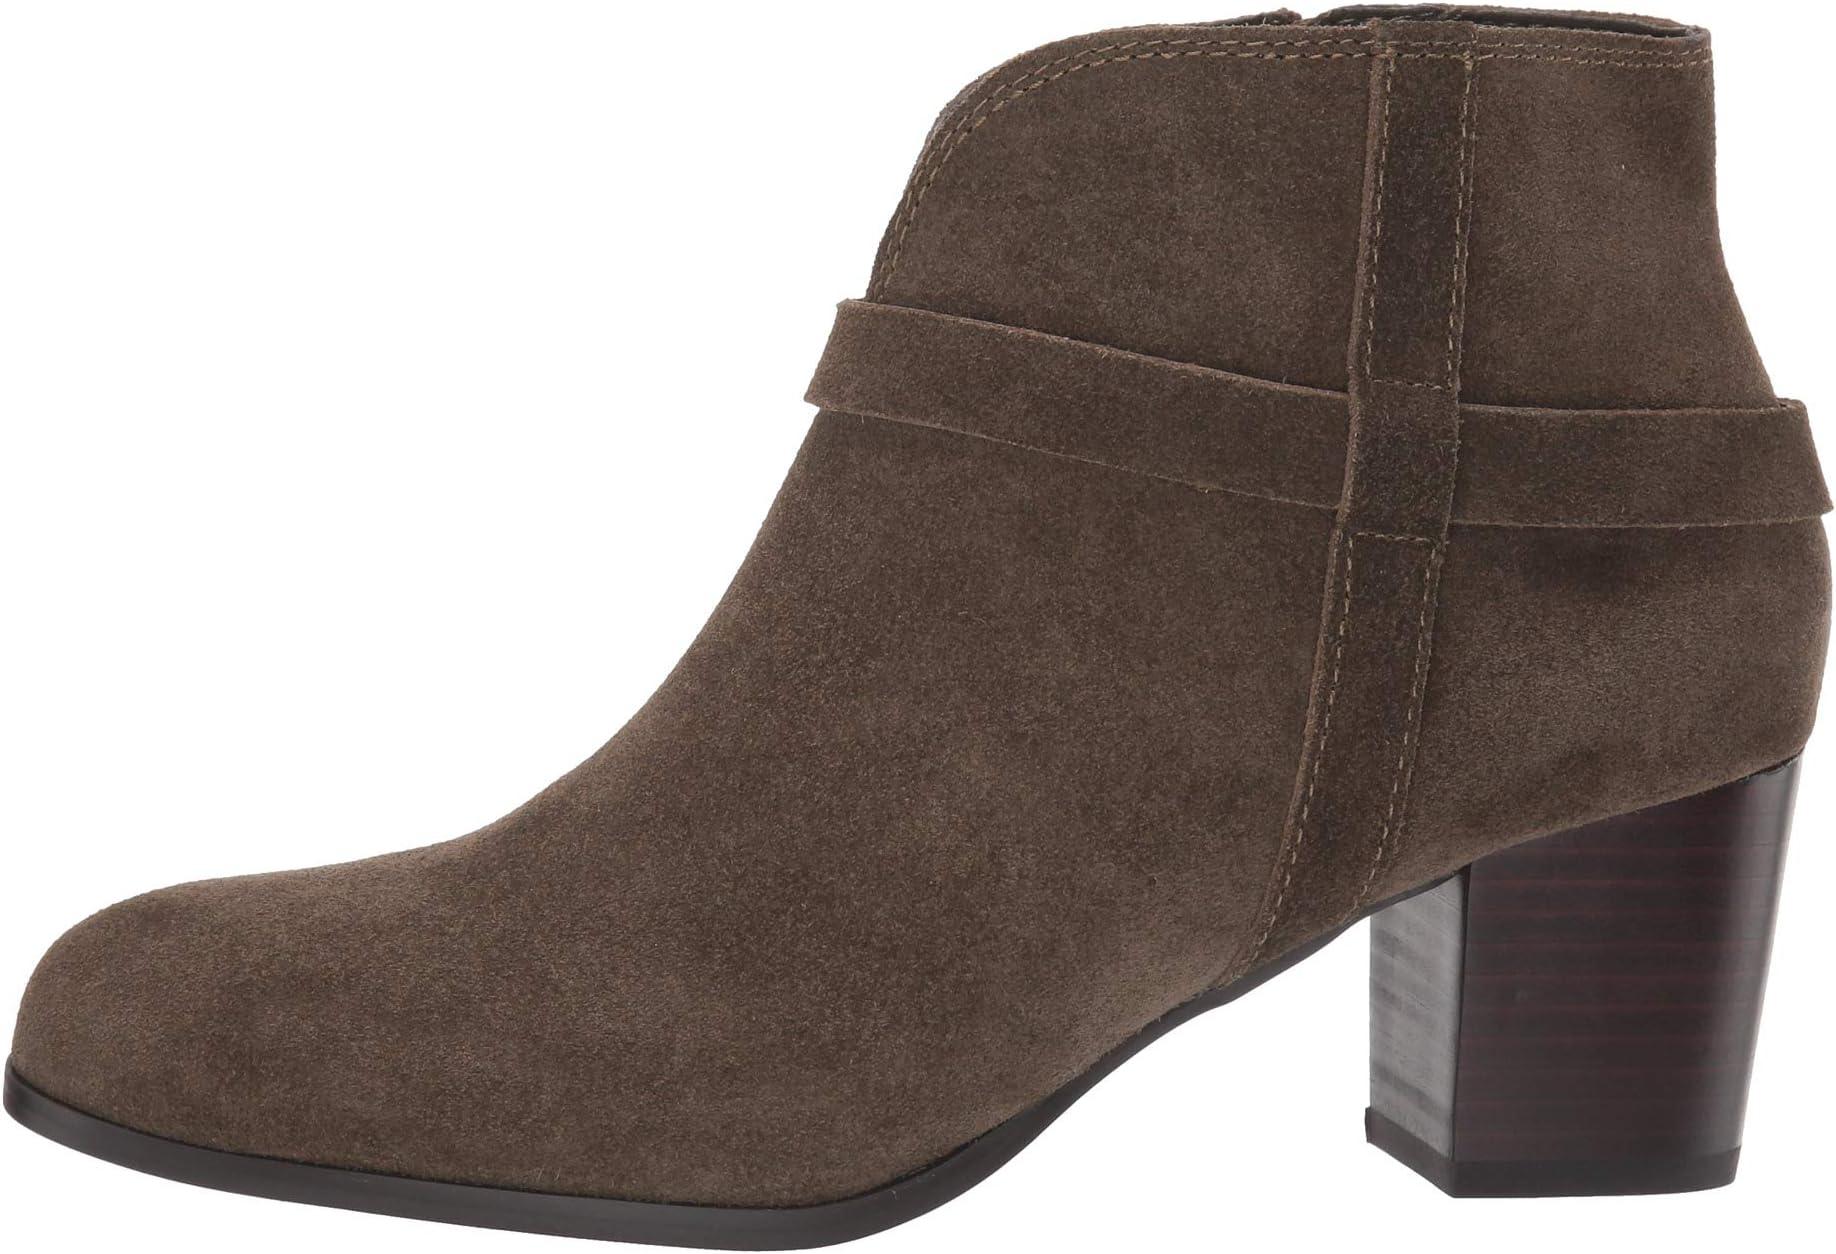 MIA Franzie | Women's shoes | 2020 Newest